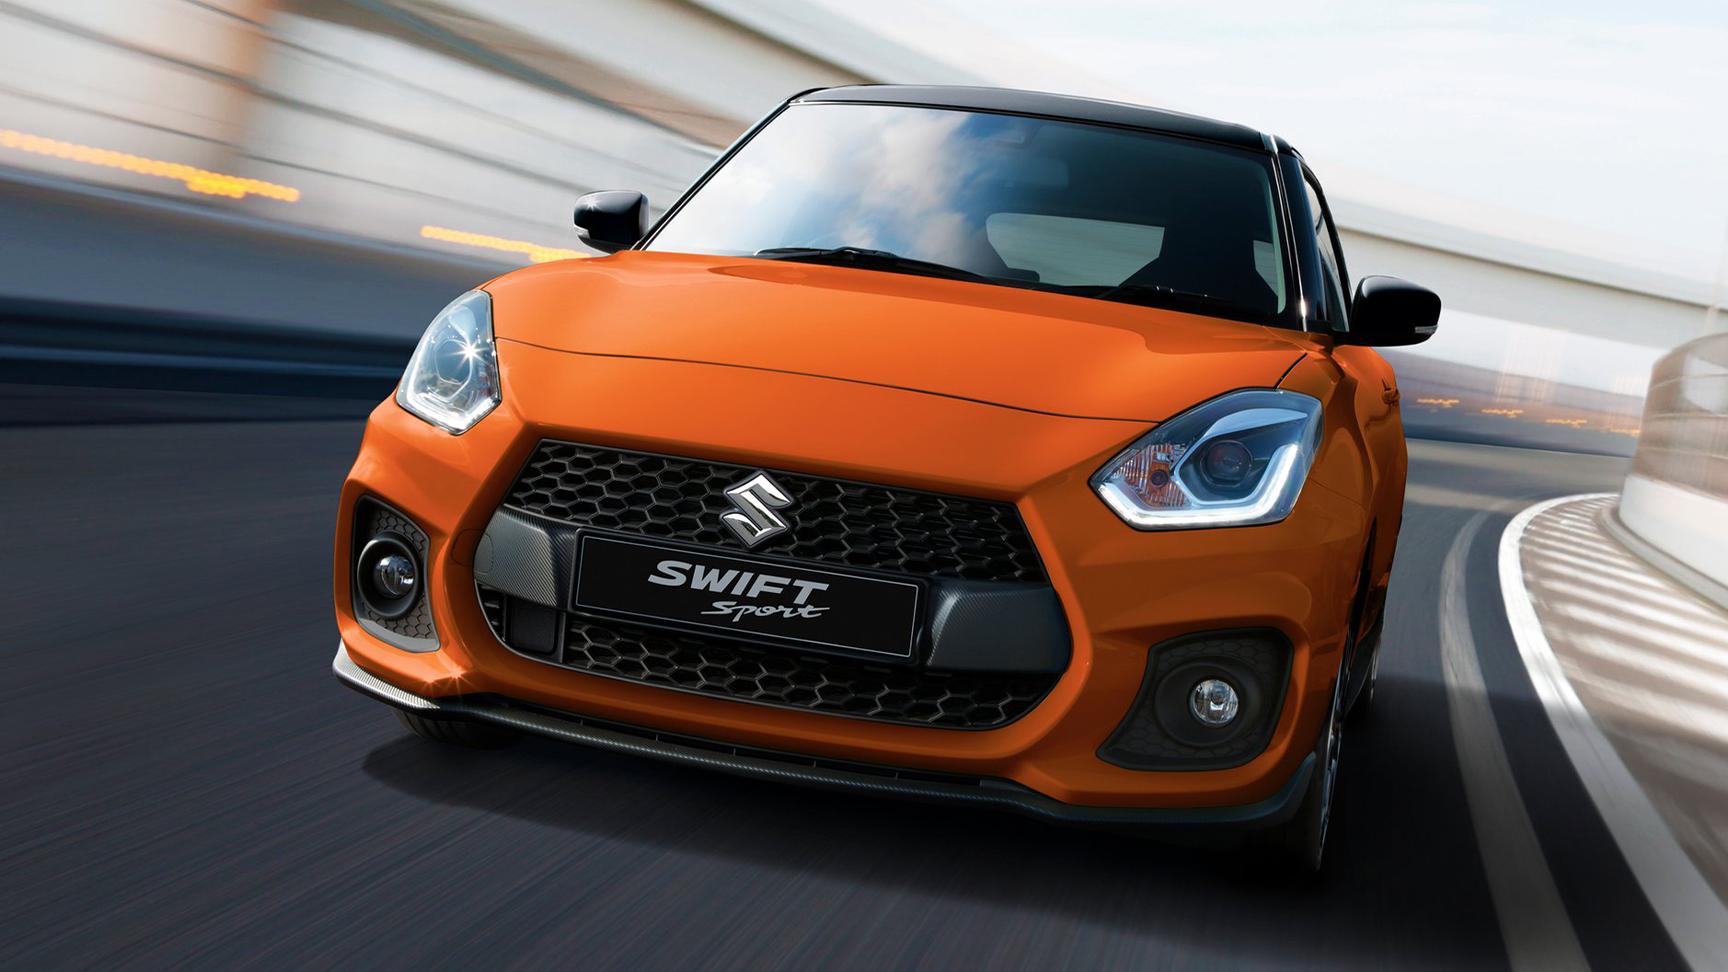 Swift Sport It's like driving a powerful, zippy, sexy metaphor